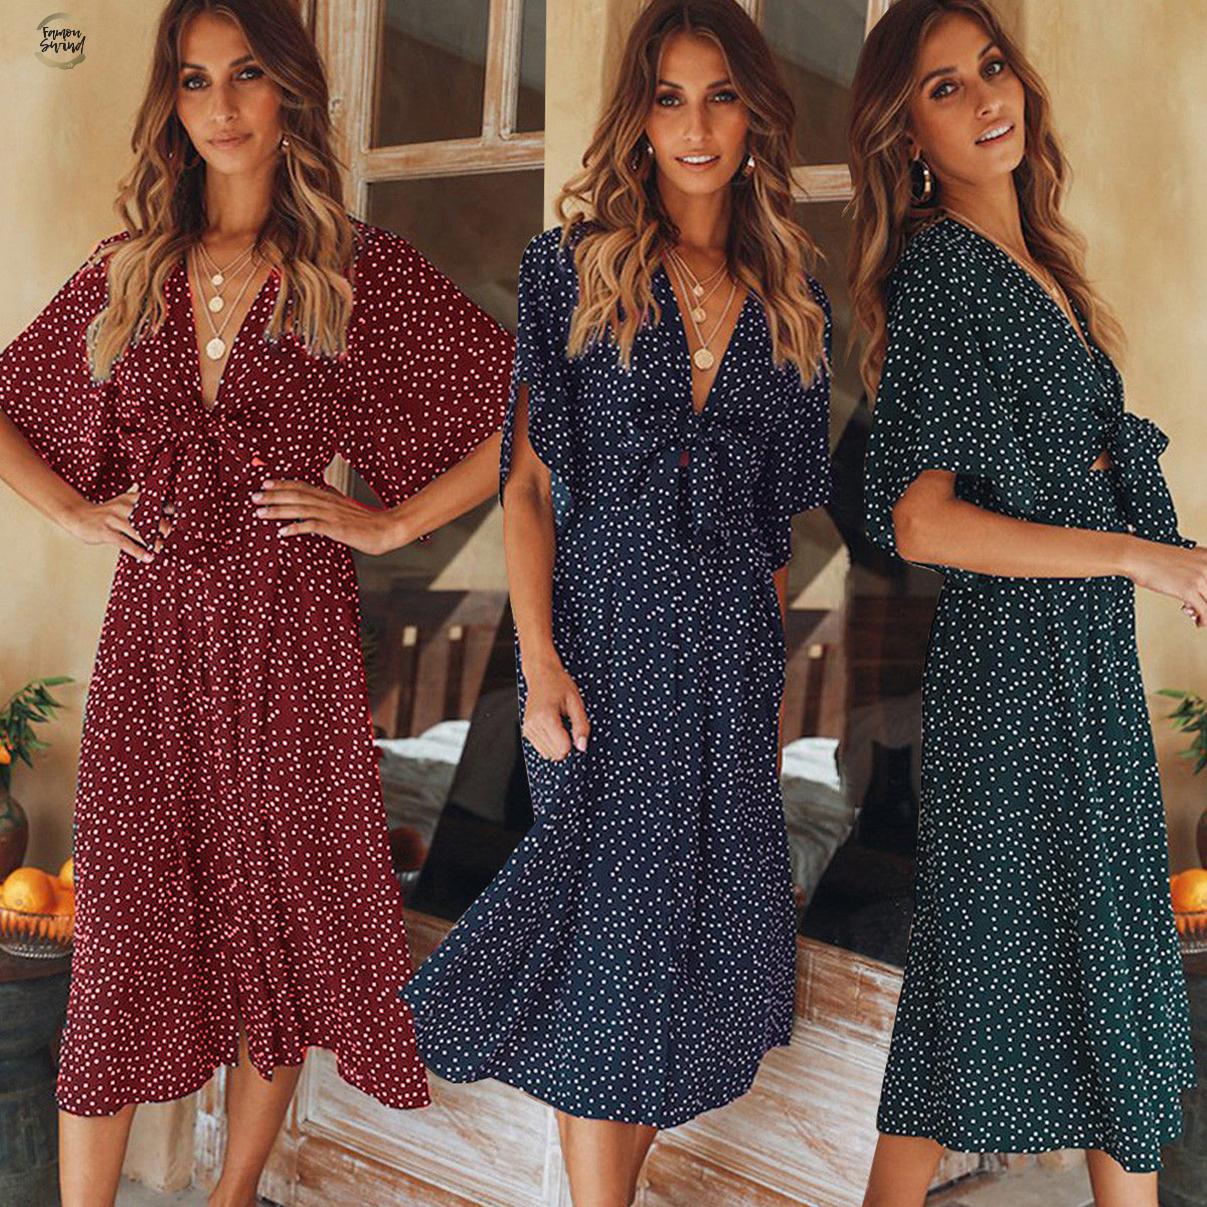 Benficial Women Casual Boho Floral Embroidery V-Neck Ruffled Linen Maxi Kaftan Dresse 2019 Summer